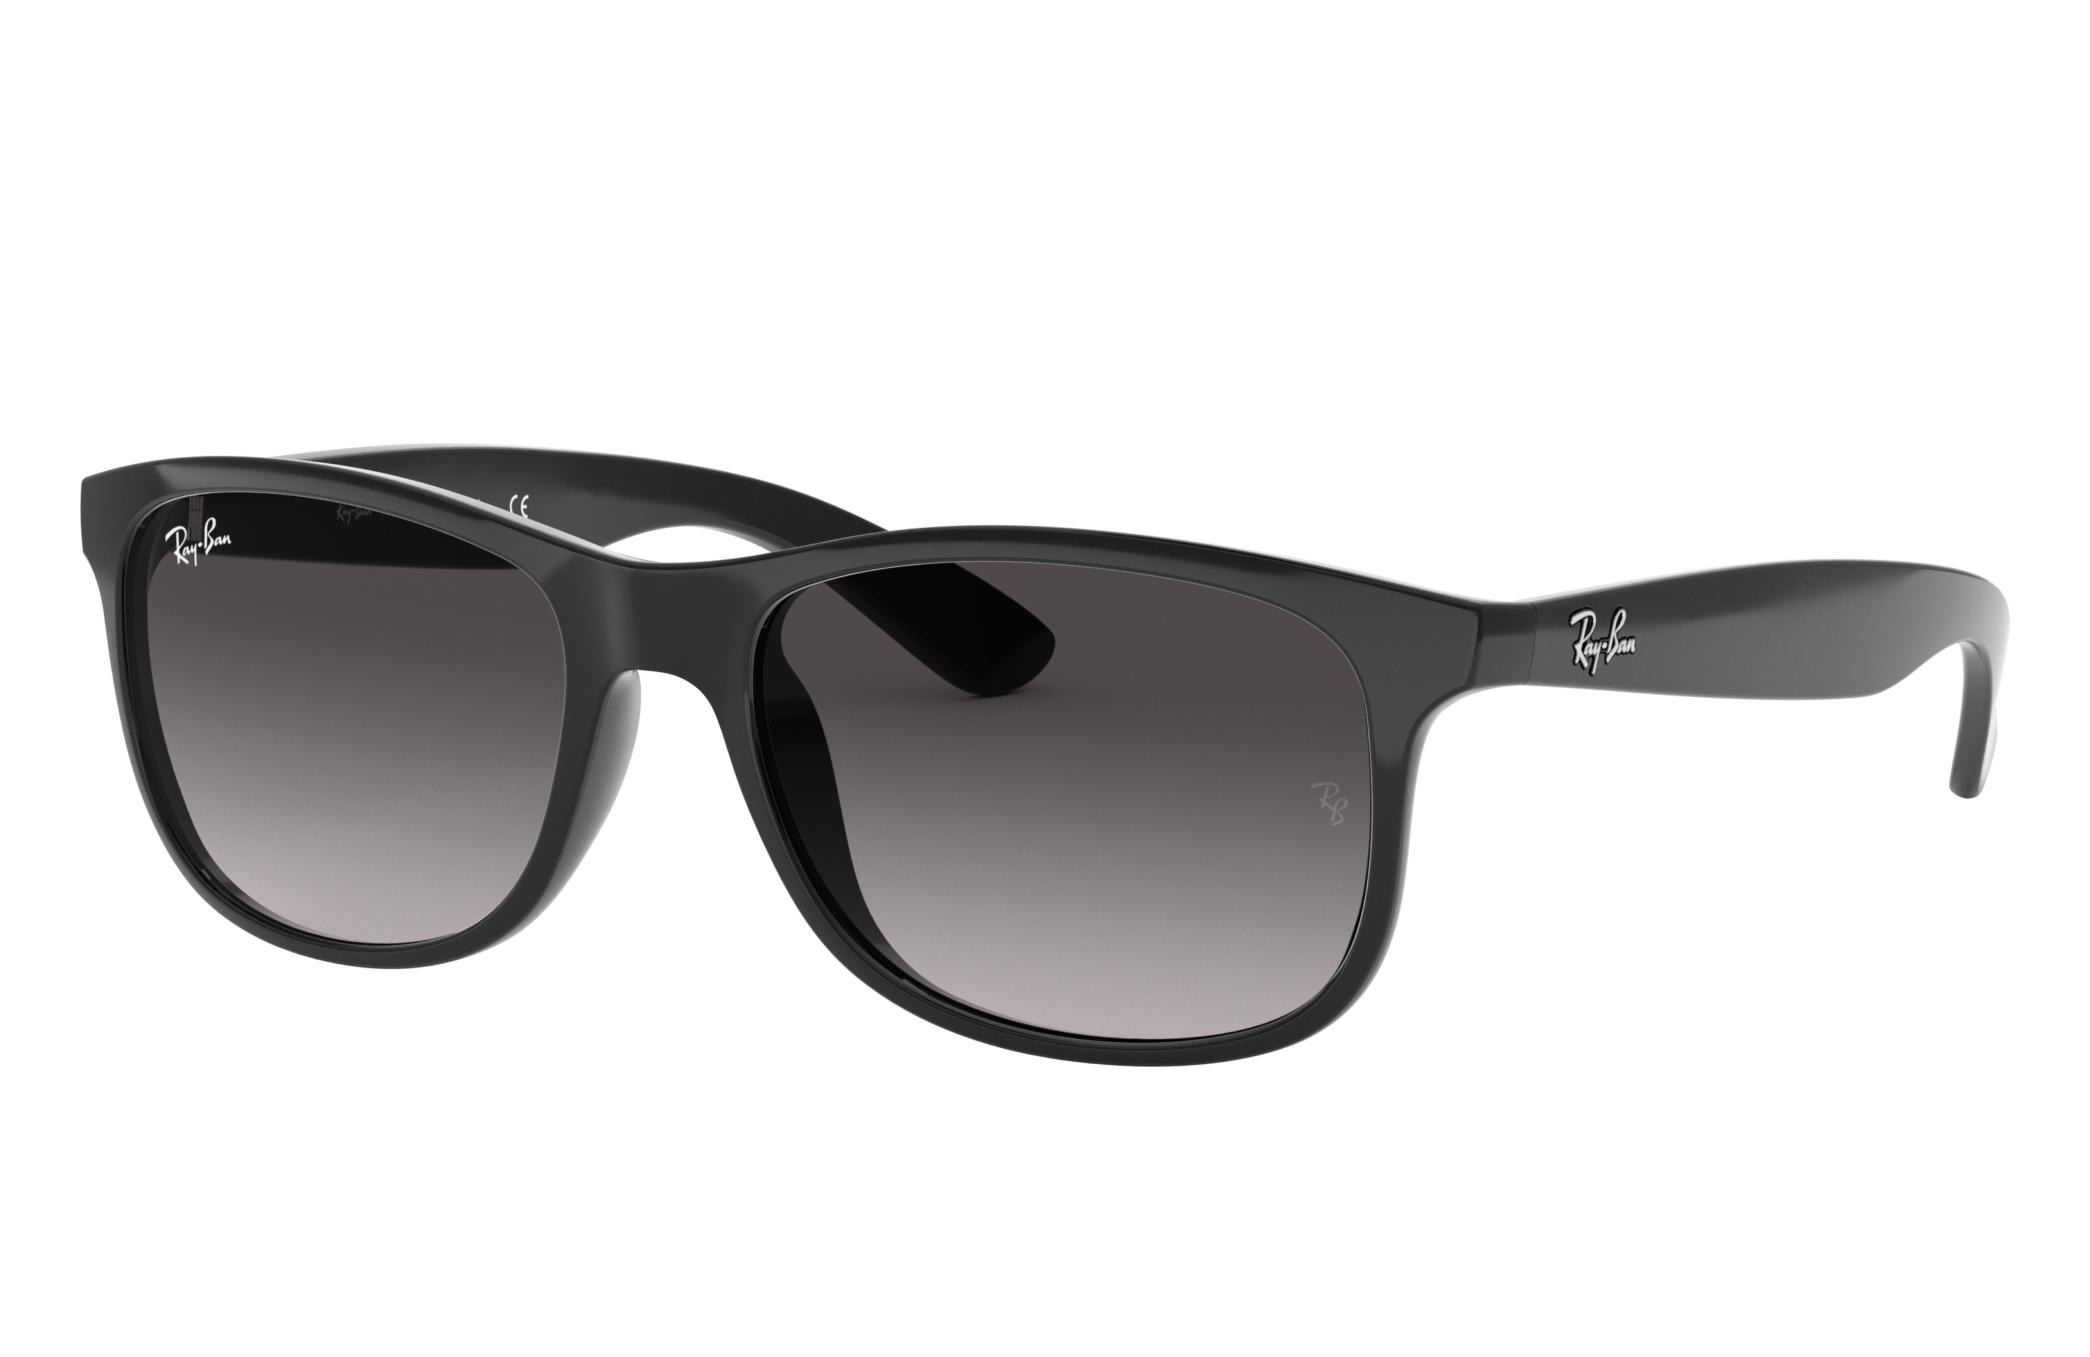 Ray-Ban Andy Black, Gray Lenses - RB4202